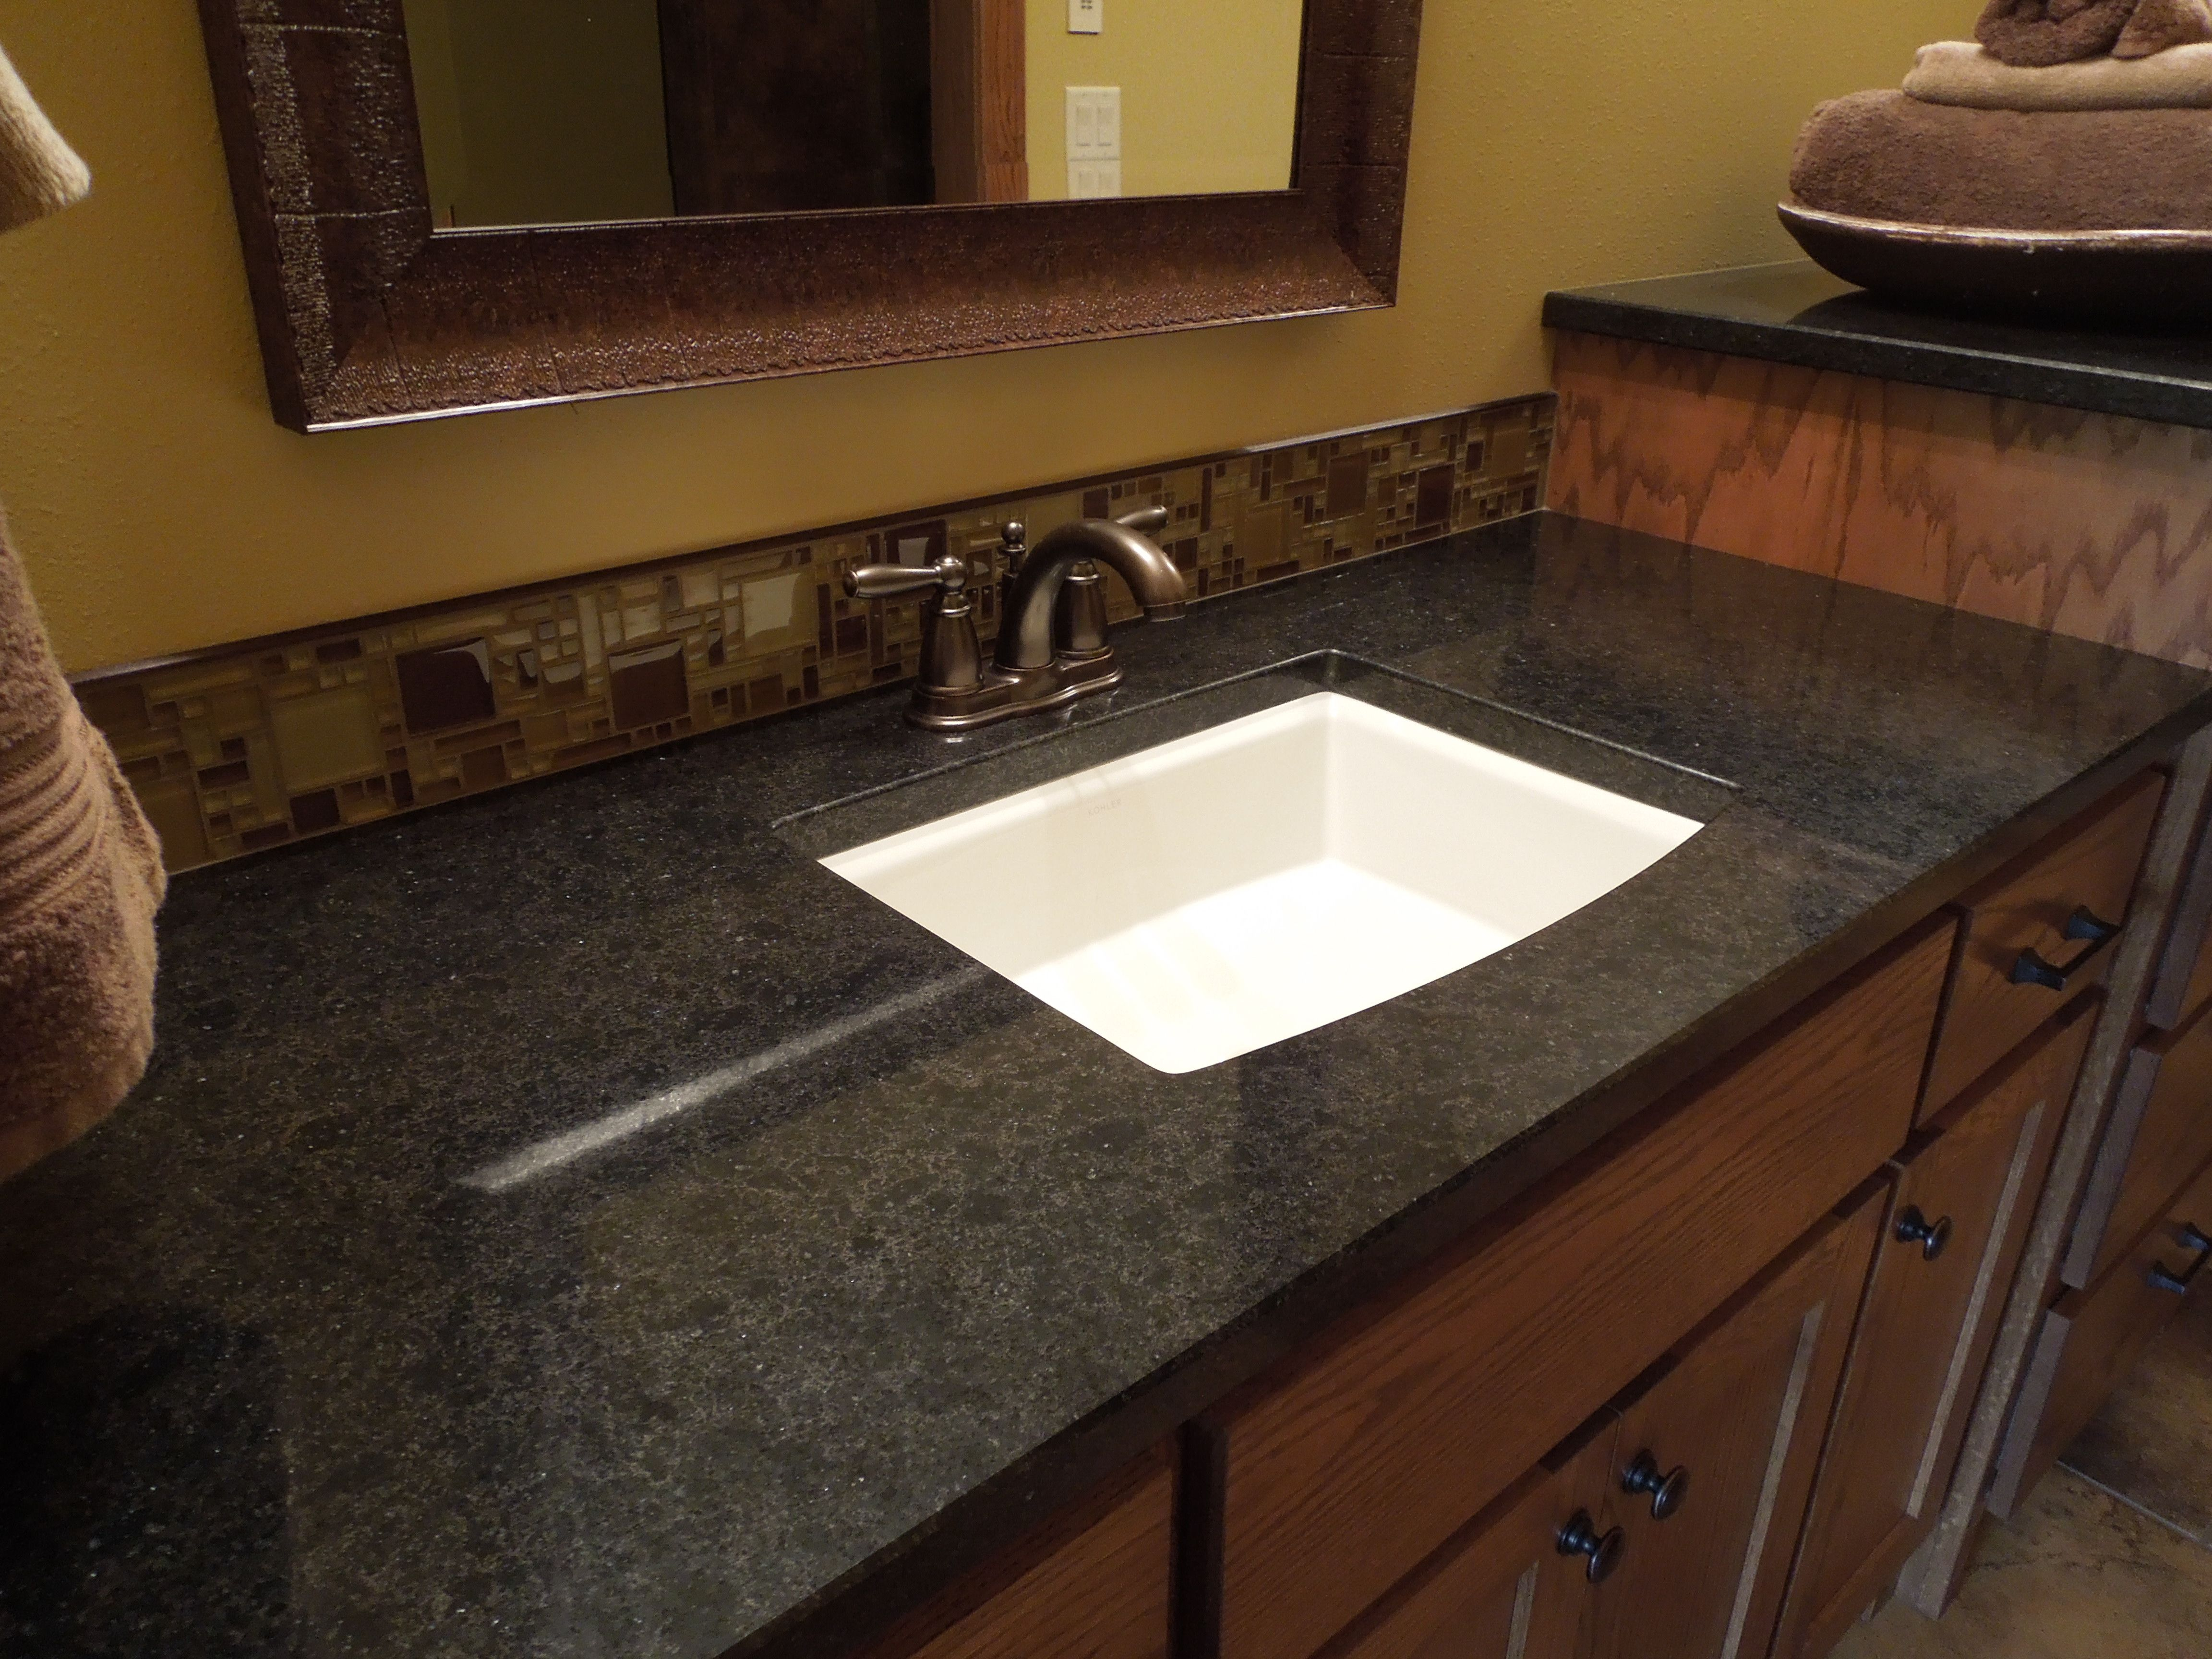 Countertop Trends for 2014 | Bathroom countertop design ... on Bathroom Ideas With Black Granite Countertops  id=79766